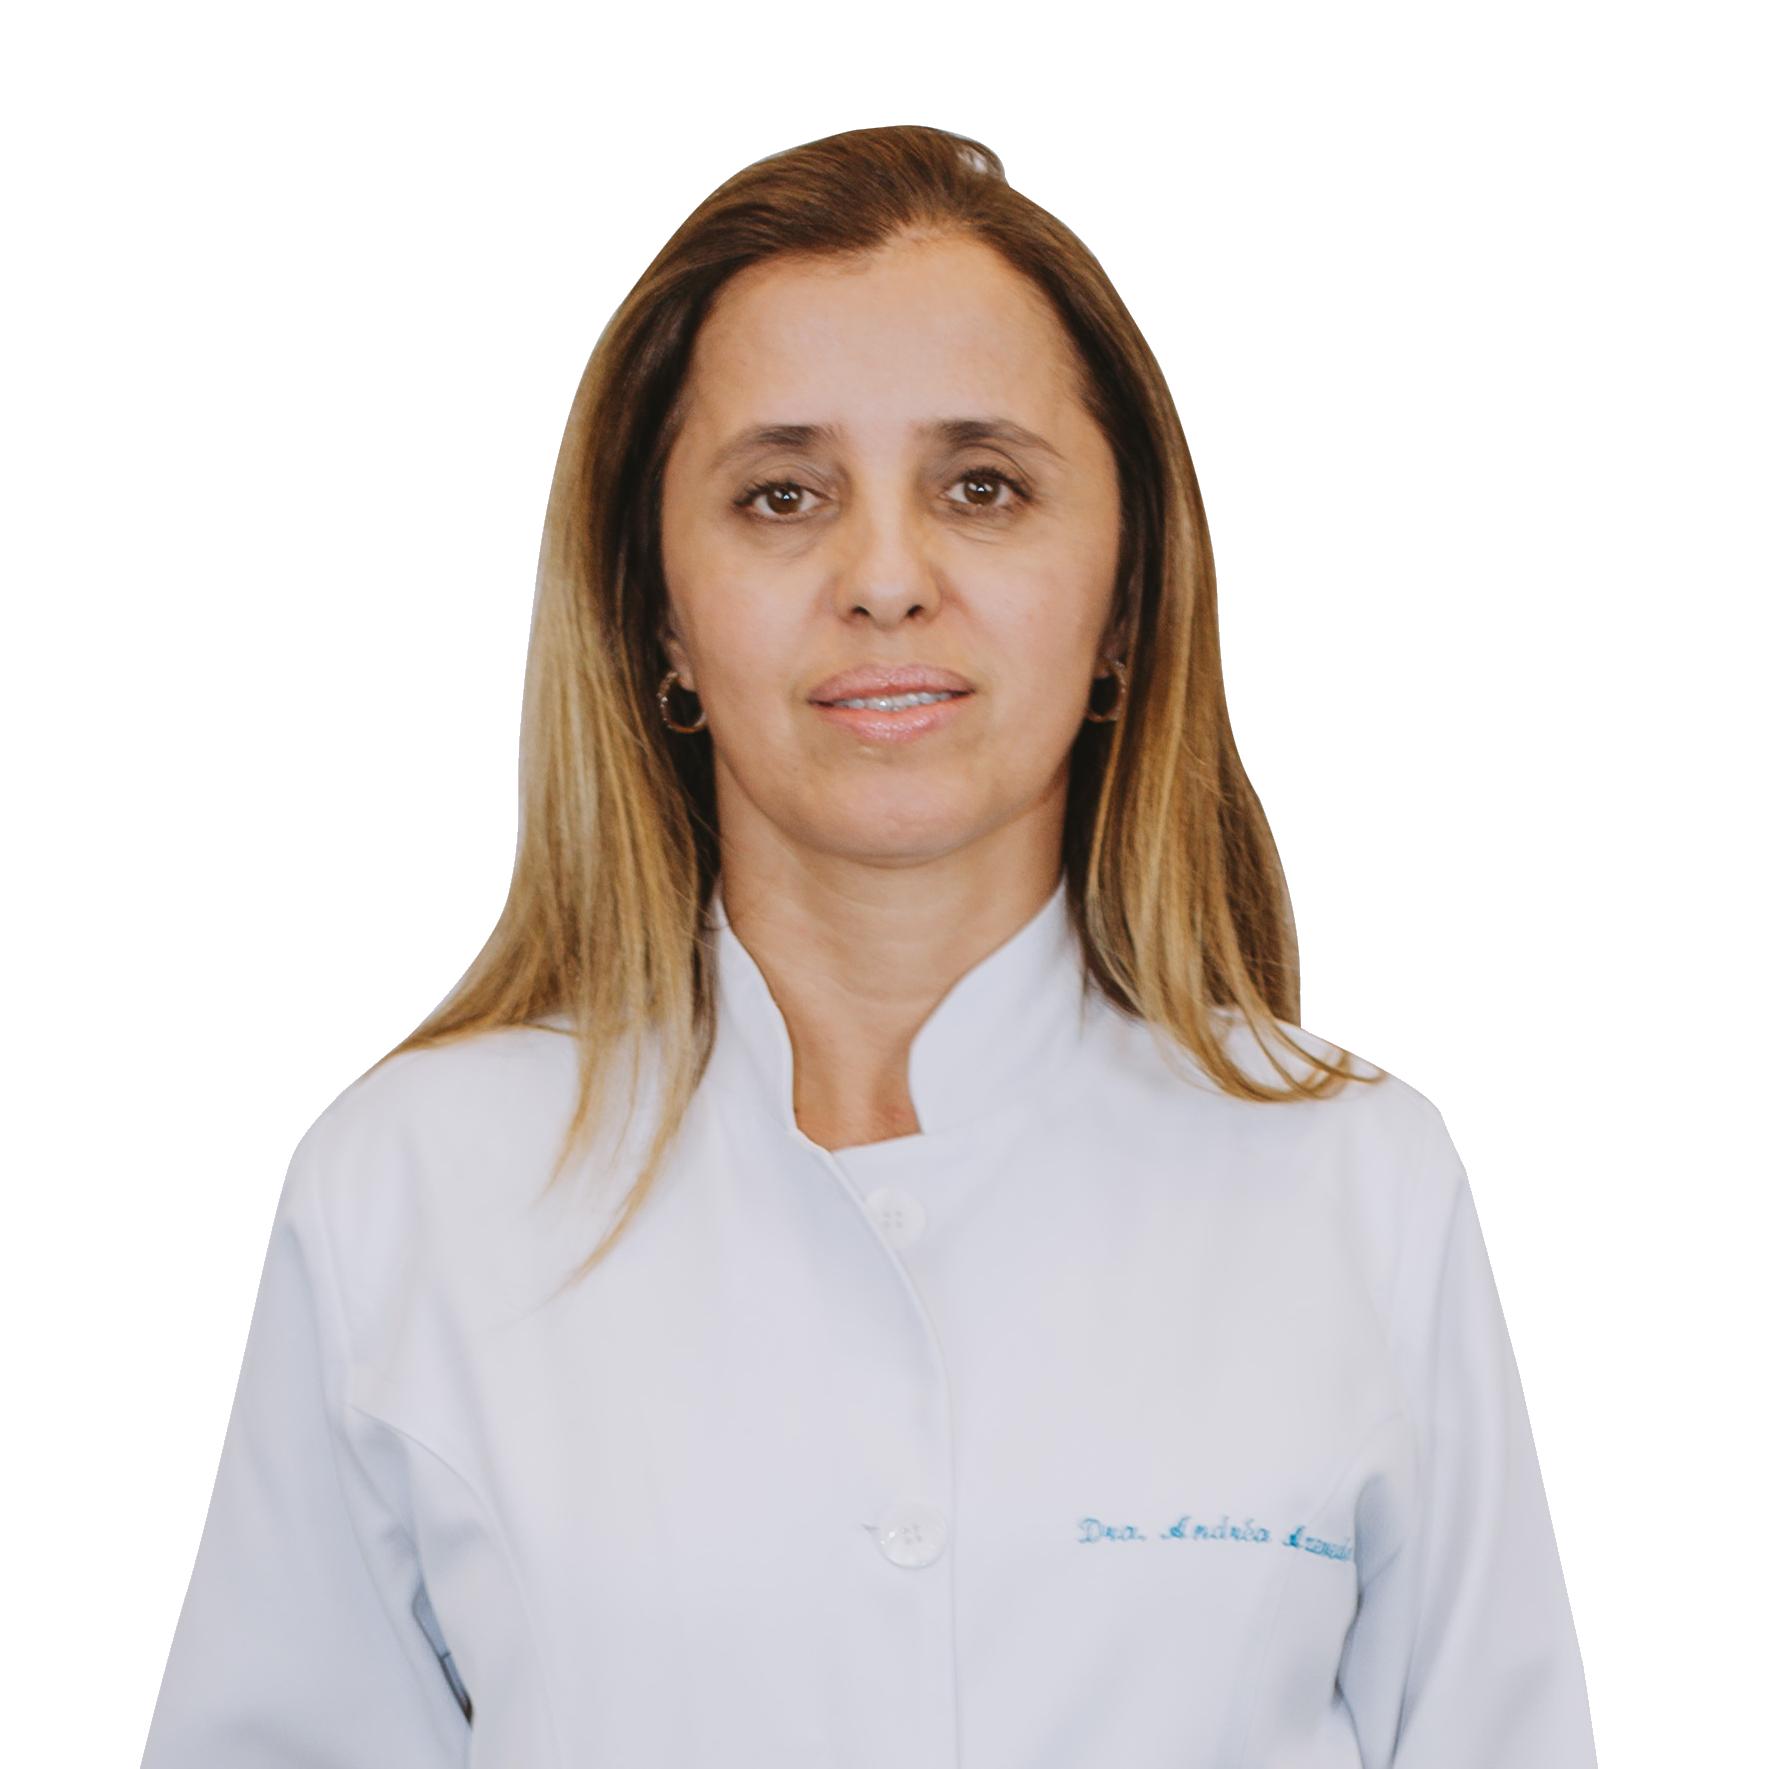 Dra. Andrea A. Costa - D'Olhos Hospital Dia